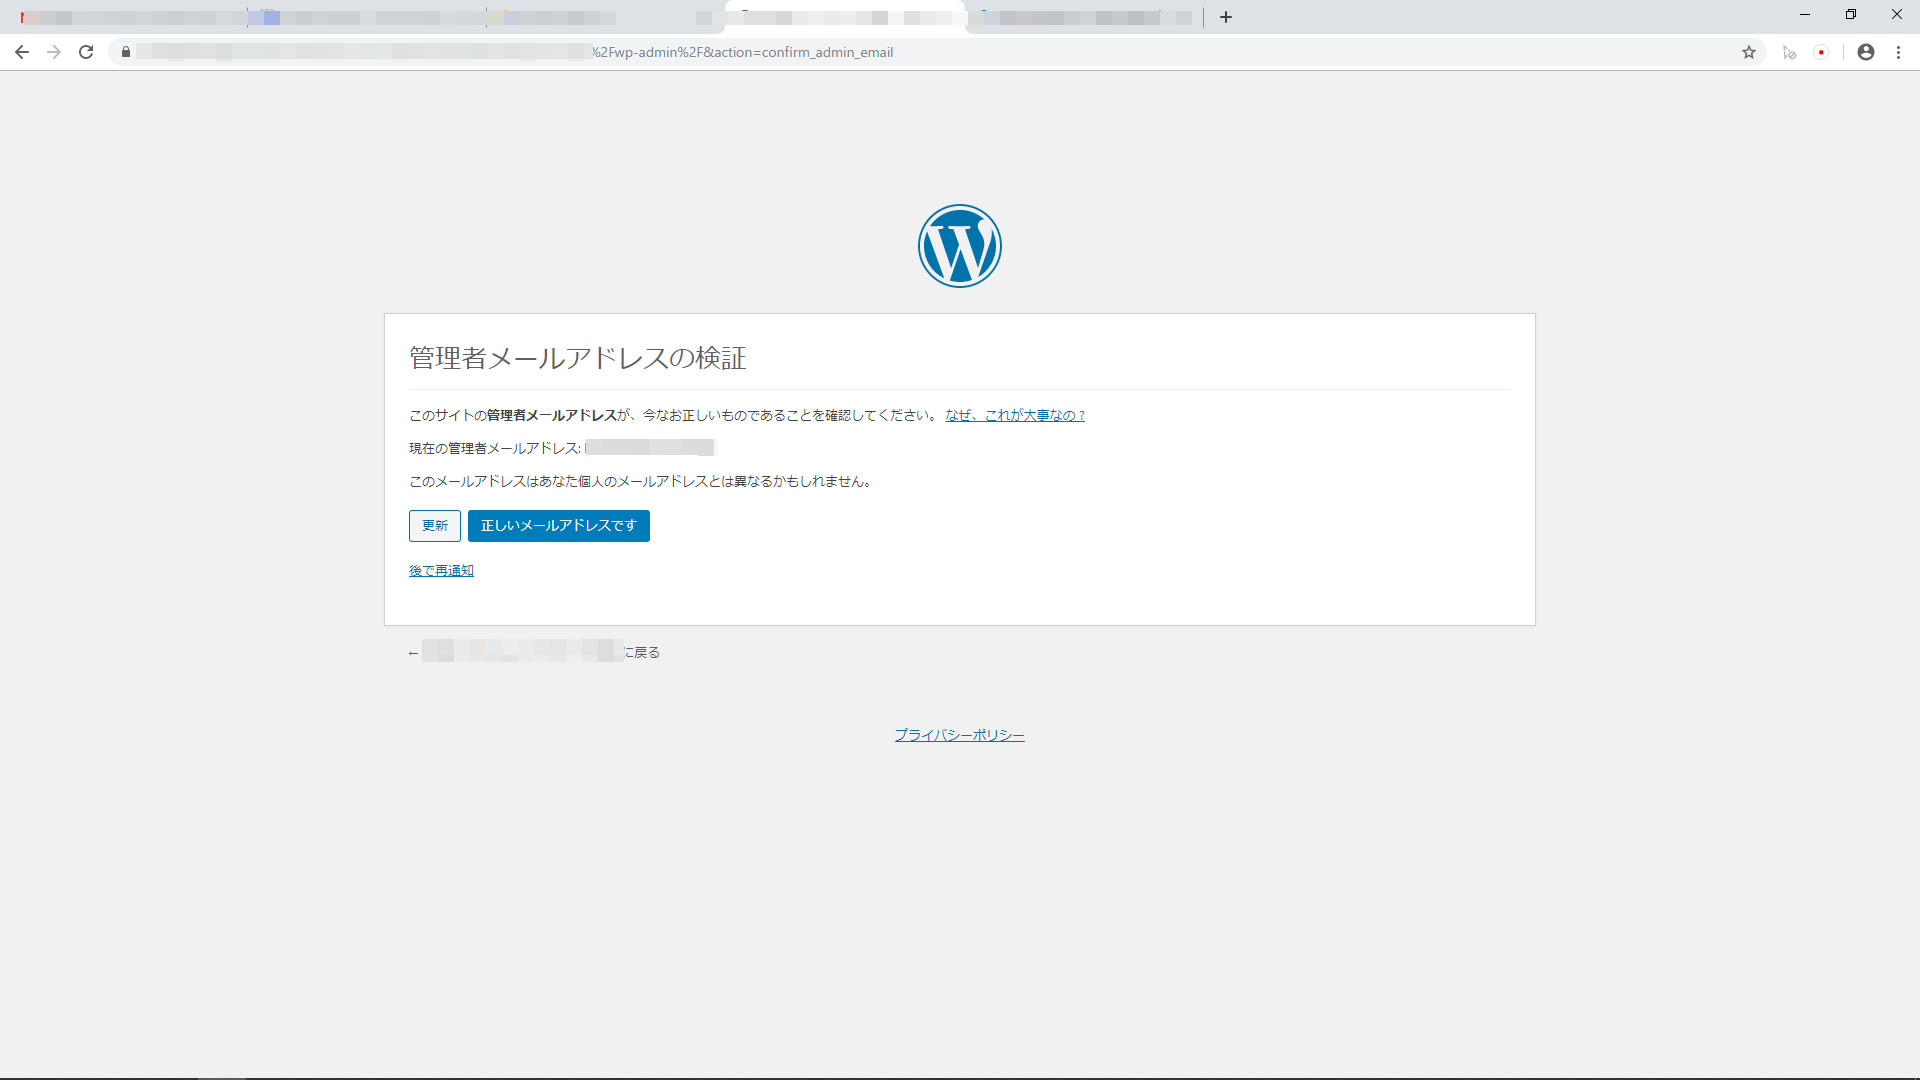 WordPress 5.3 管理者メールアドレス検証